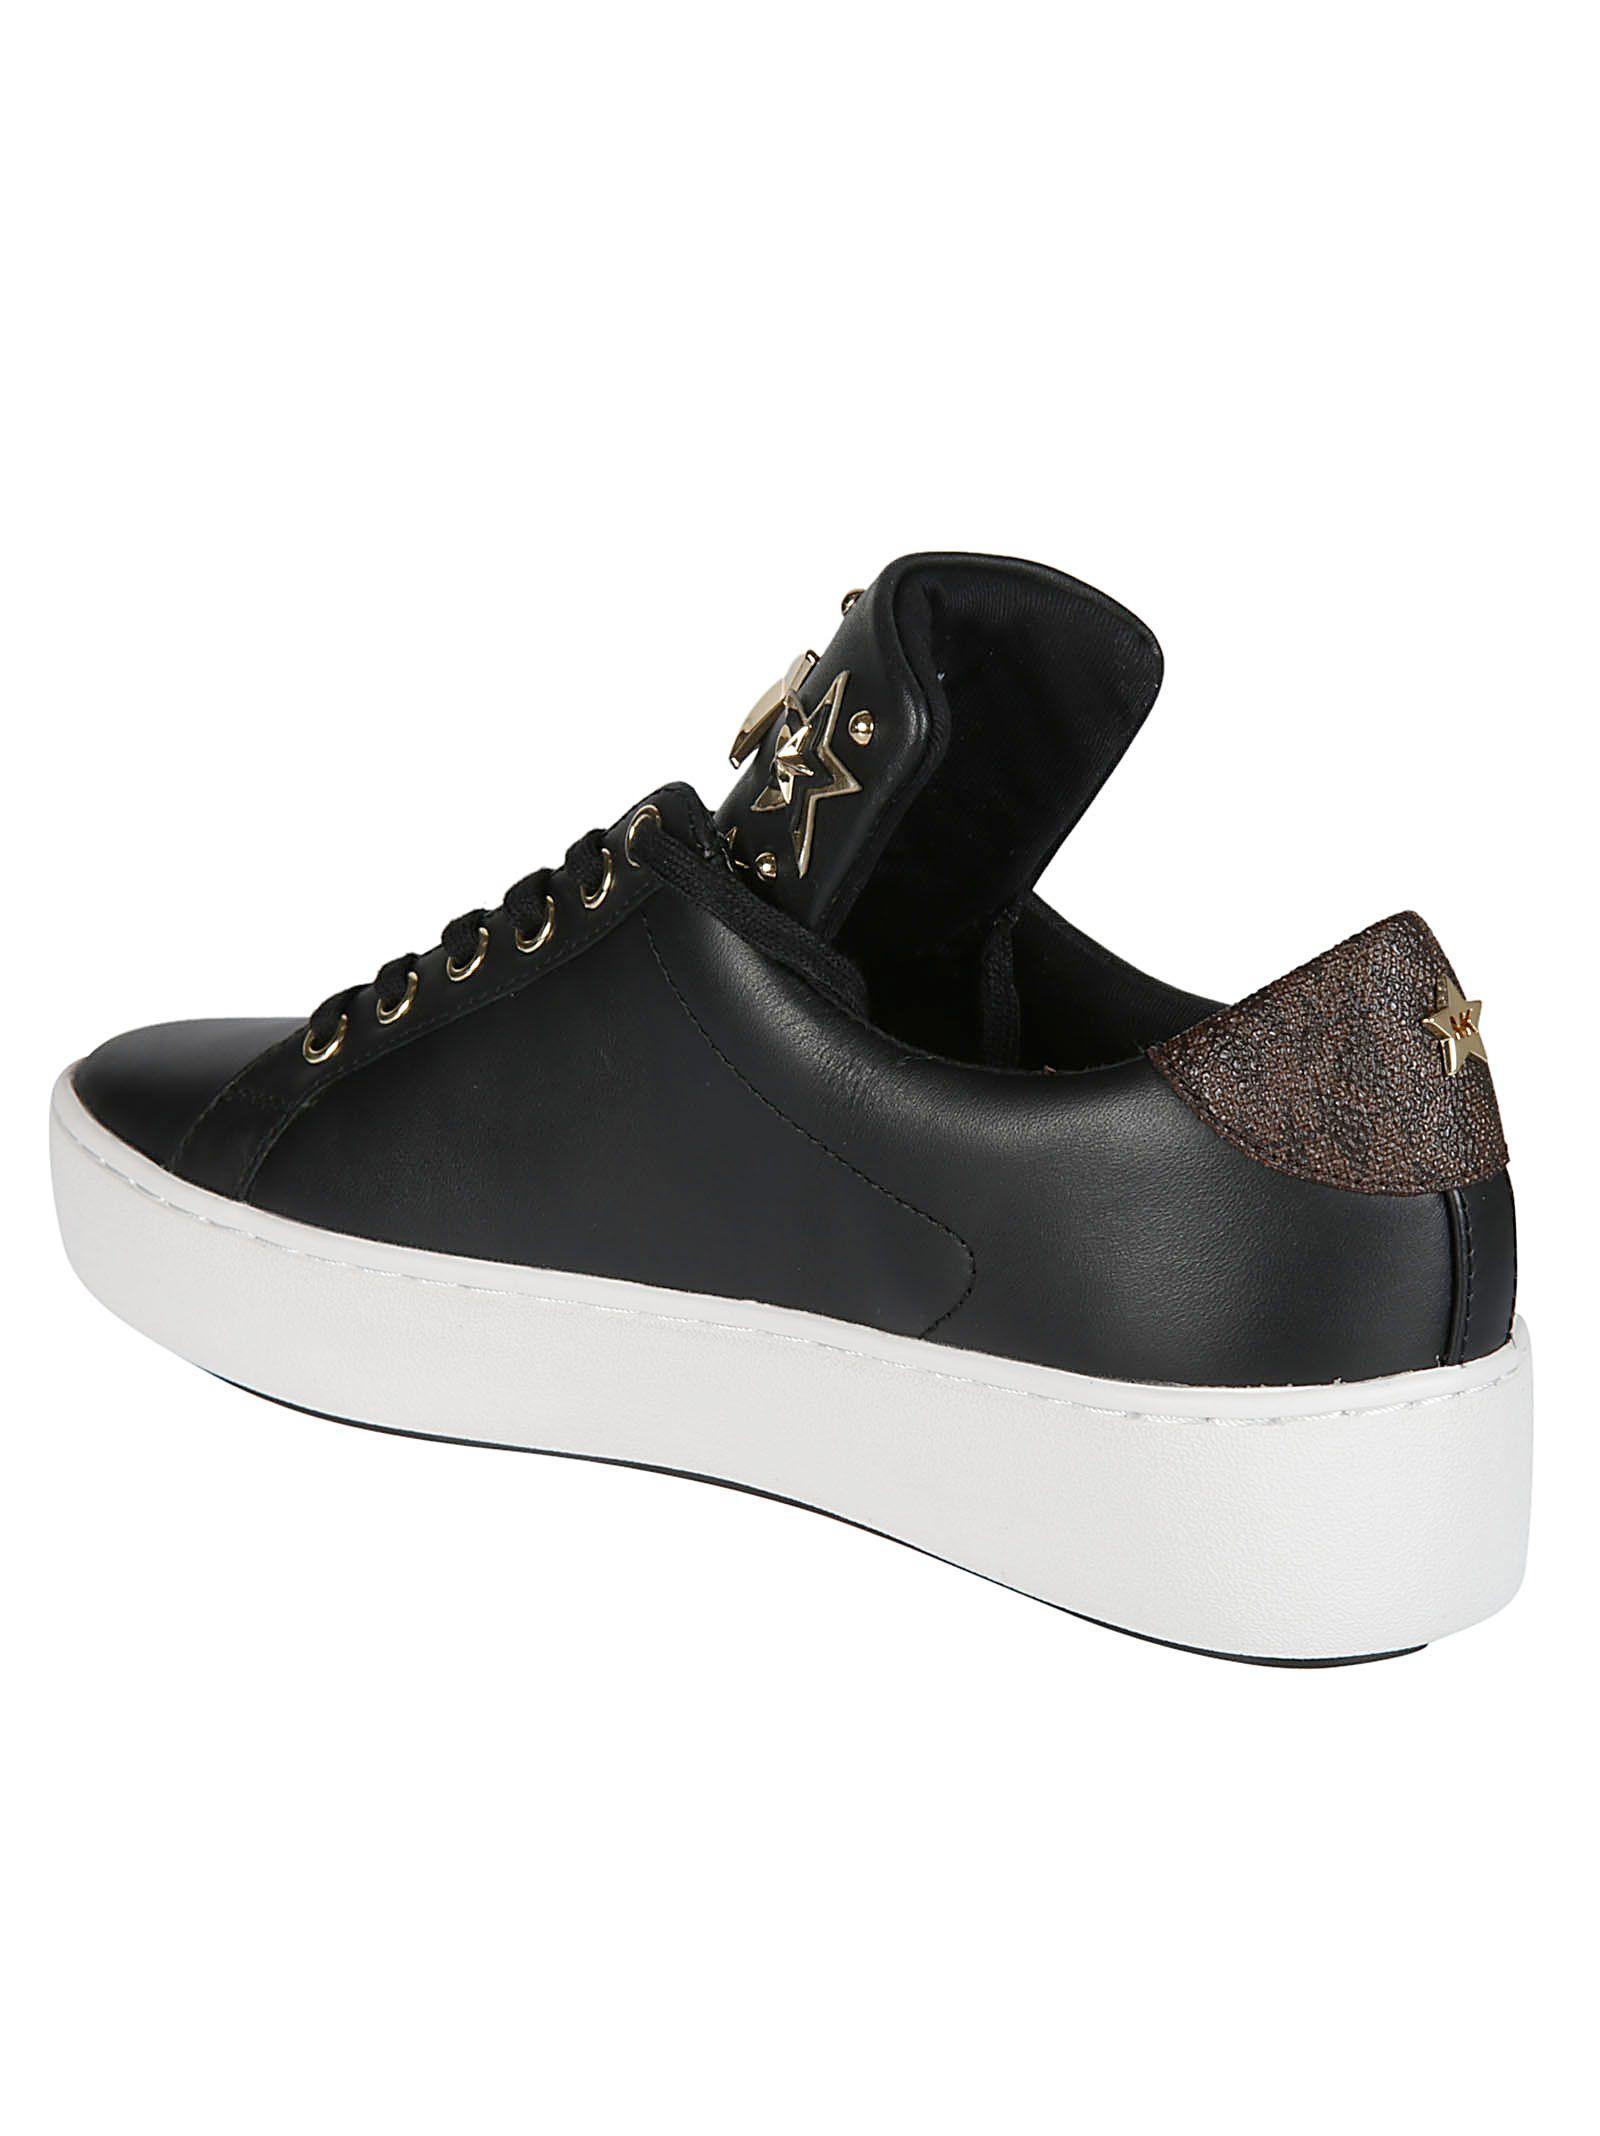 63ca37195fa Michael Kors Michael Kors Star Studded Sneakers - Black/White ...